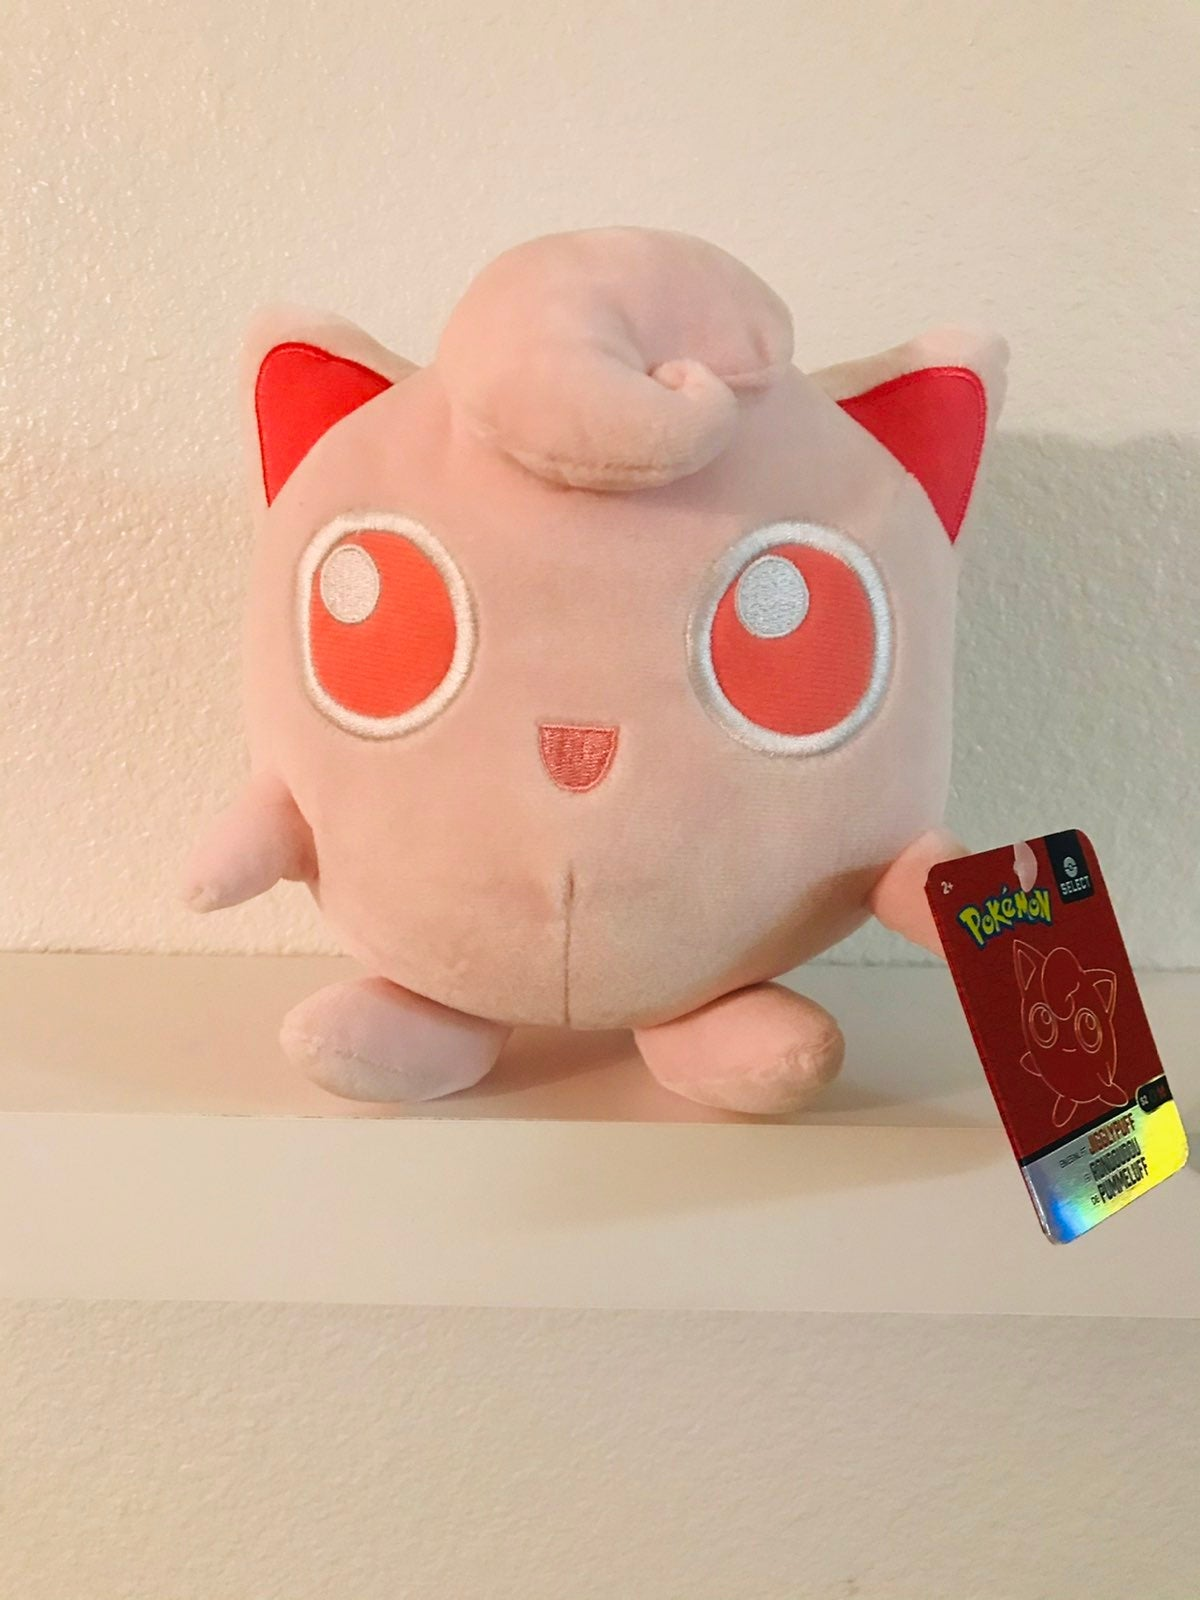 Jigglypuff Select Tonal Pokemon Plush